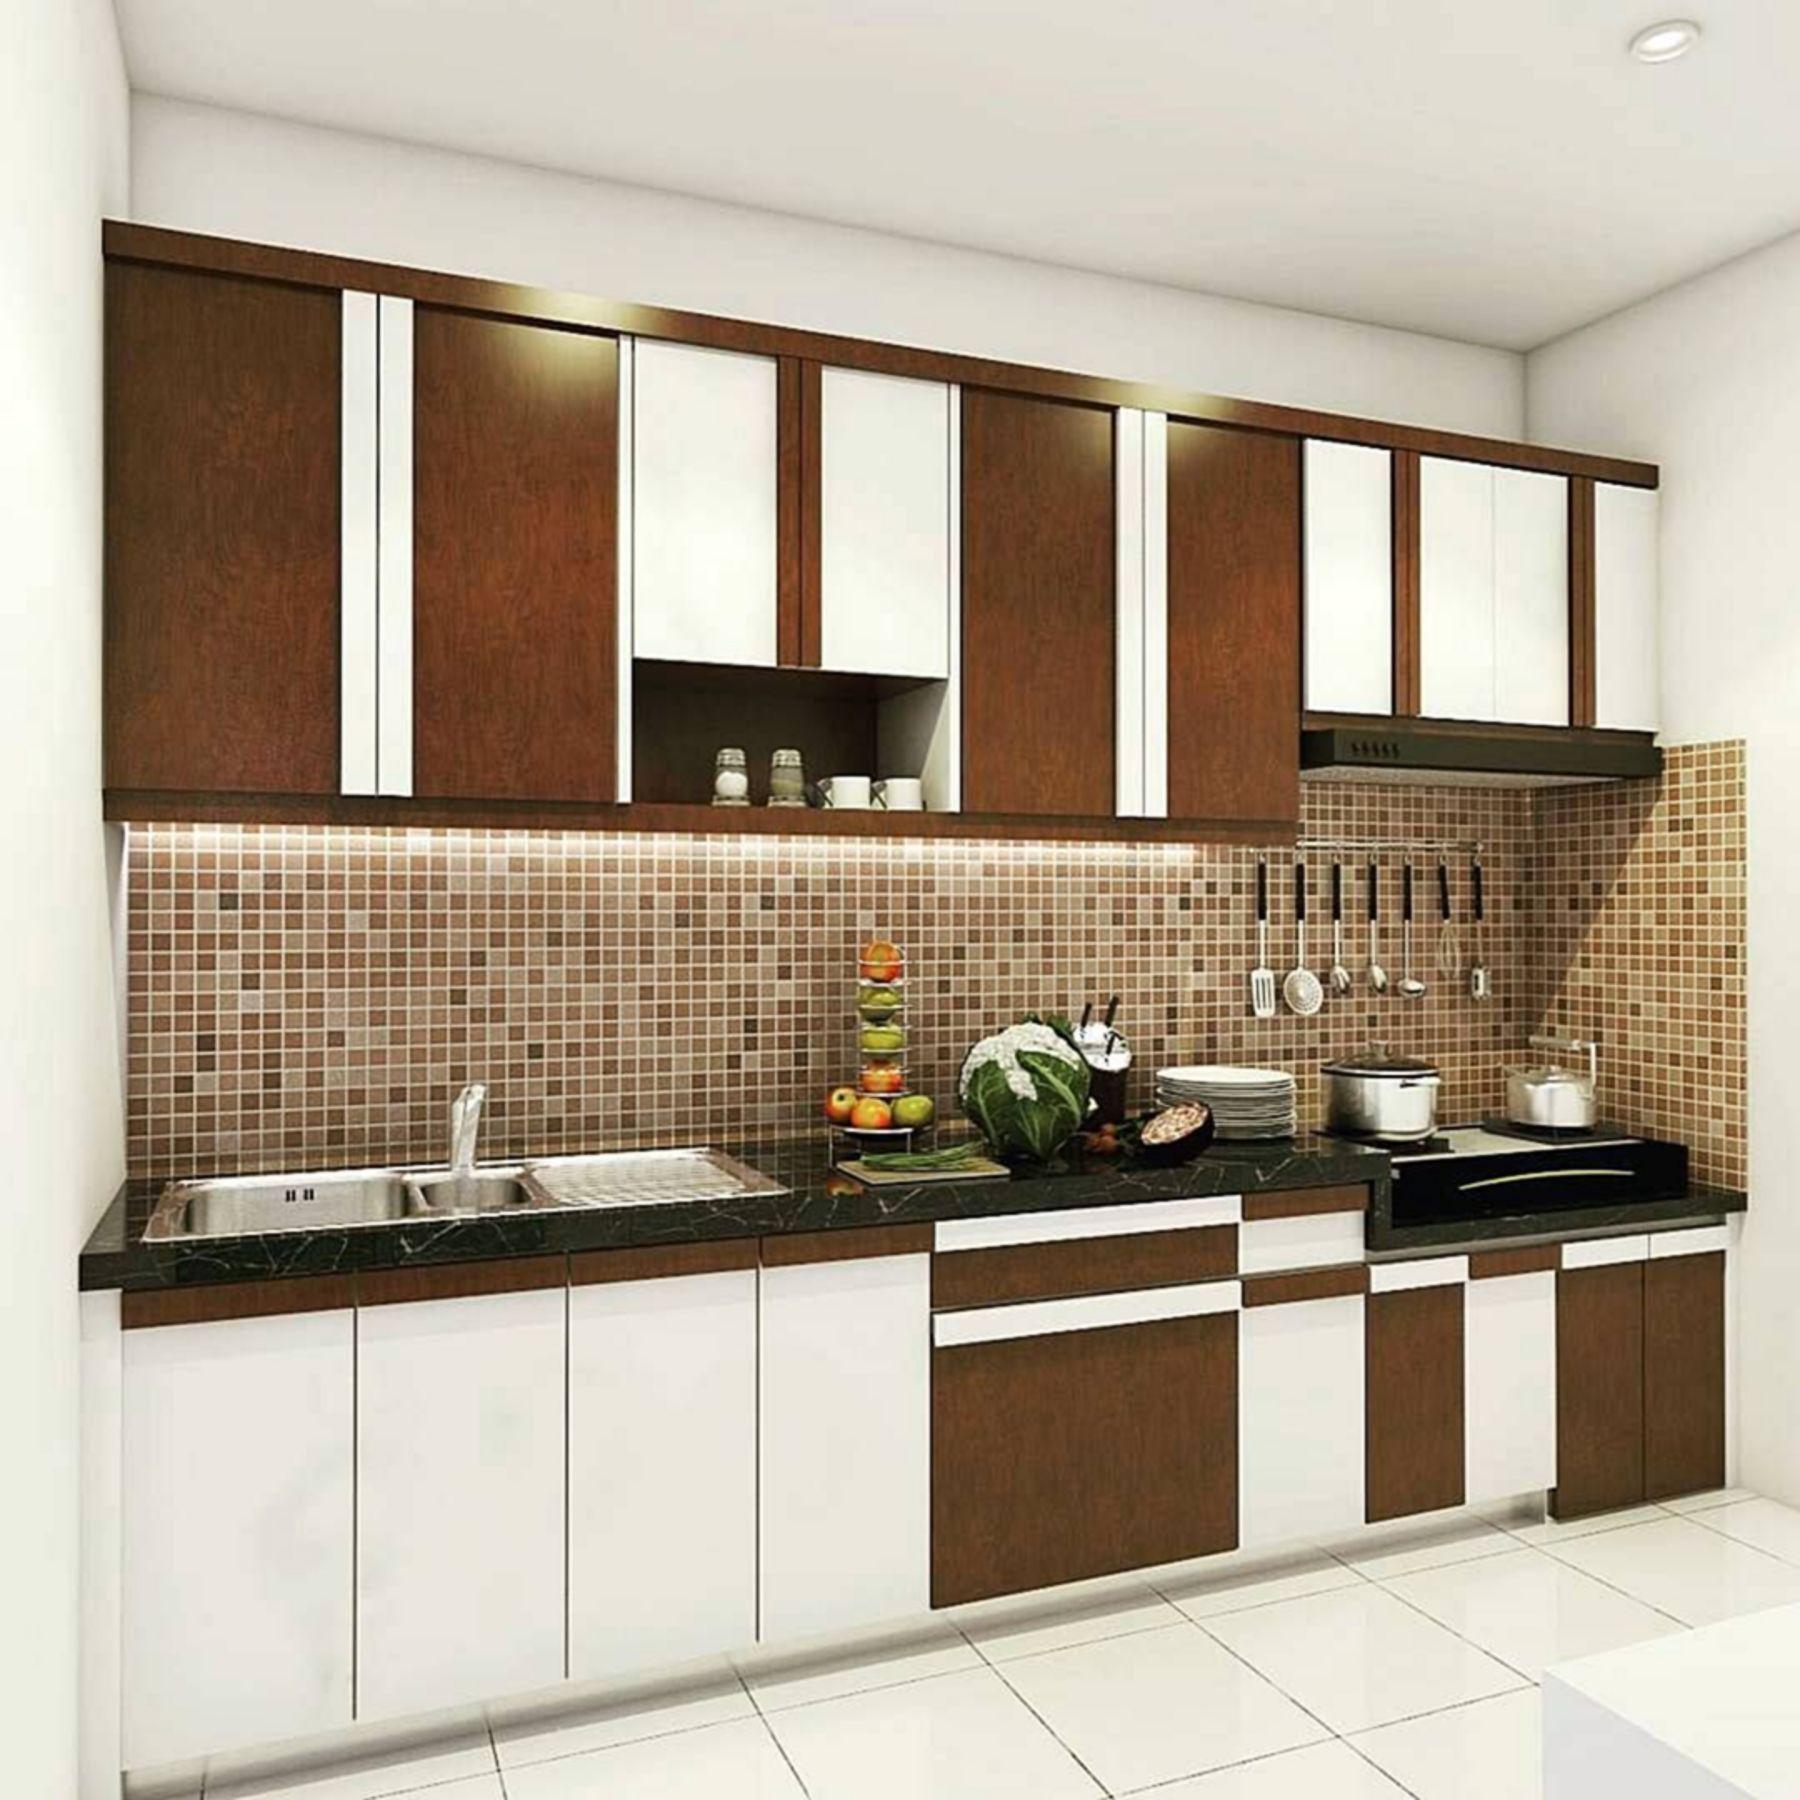 Interesting 10+ Minimalist Kitchen Set Design Ideas For